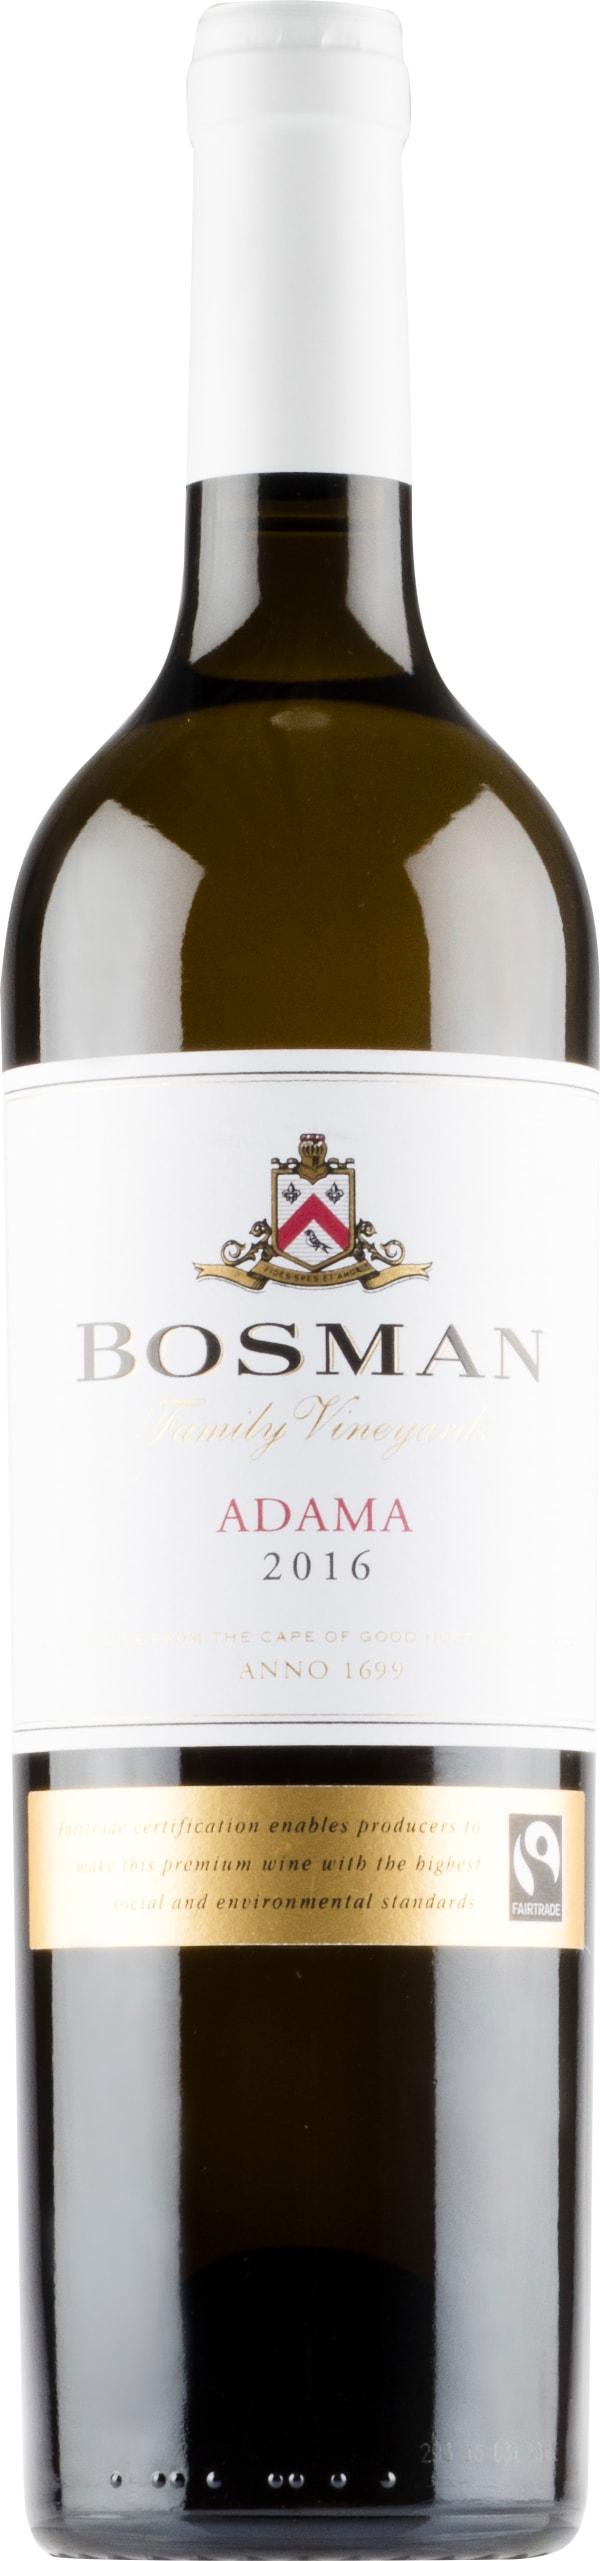 Bosman Adama 2017